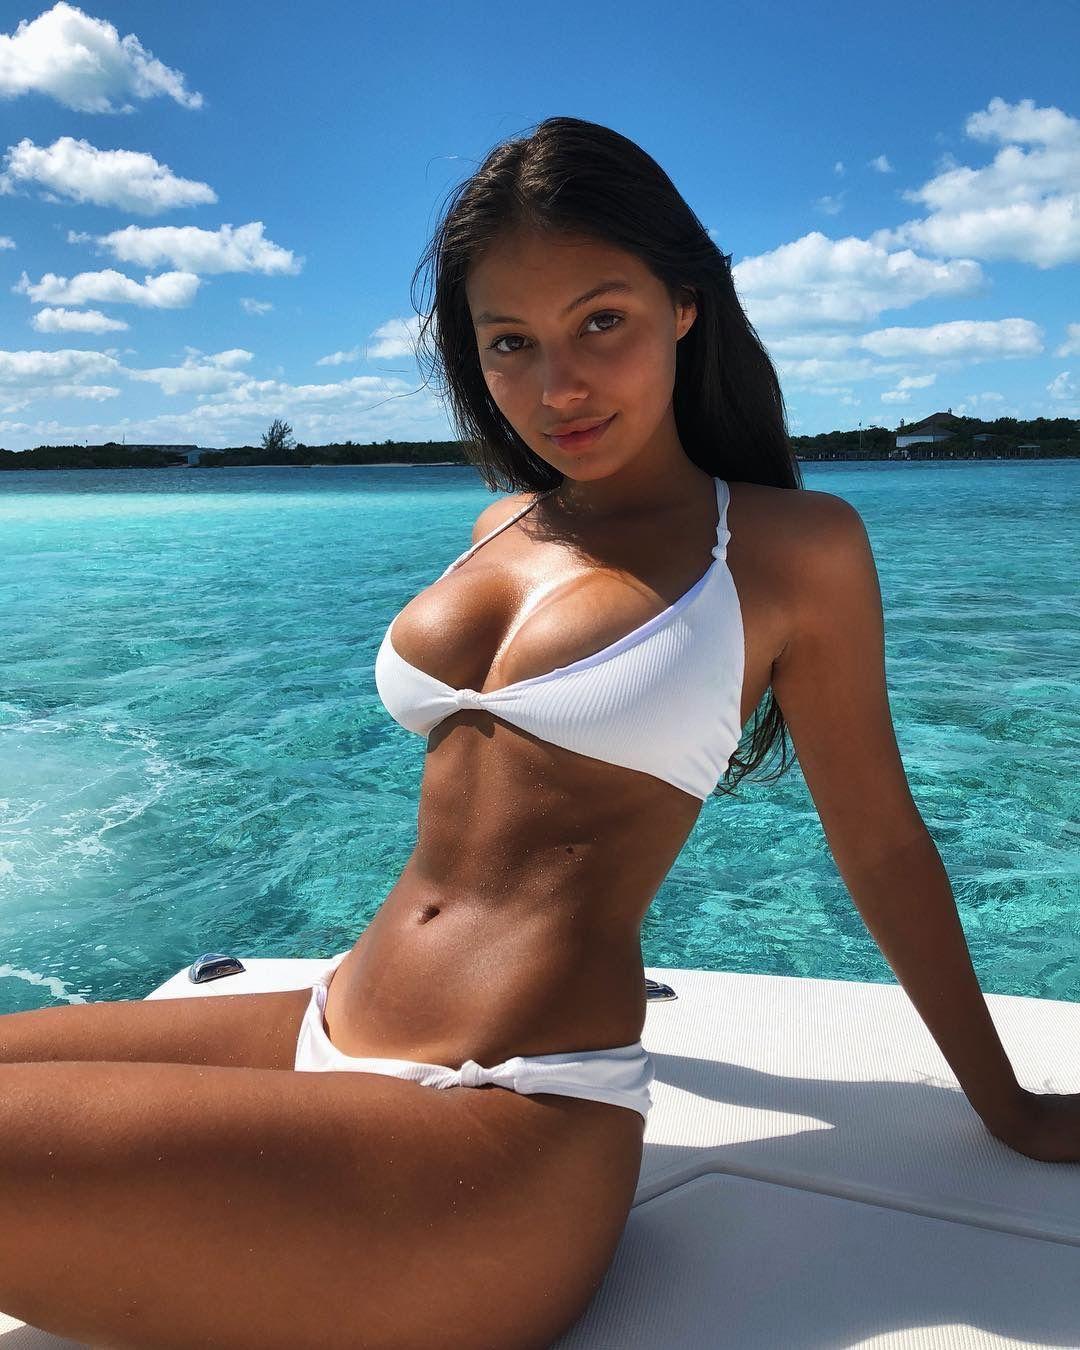 40168d3c6c Bikini Babes, Bikini Models, Hot Bikini, Lingerie Models, Bikini Girls,  Swimwear